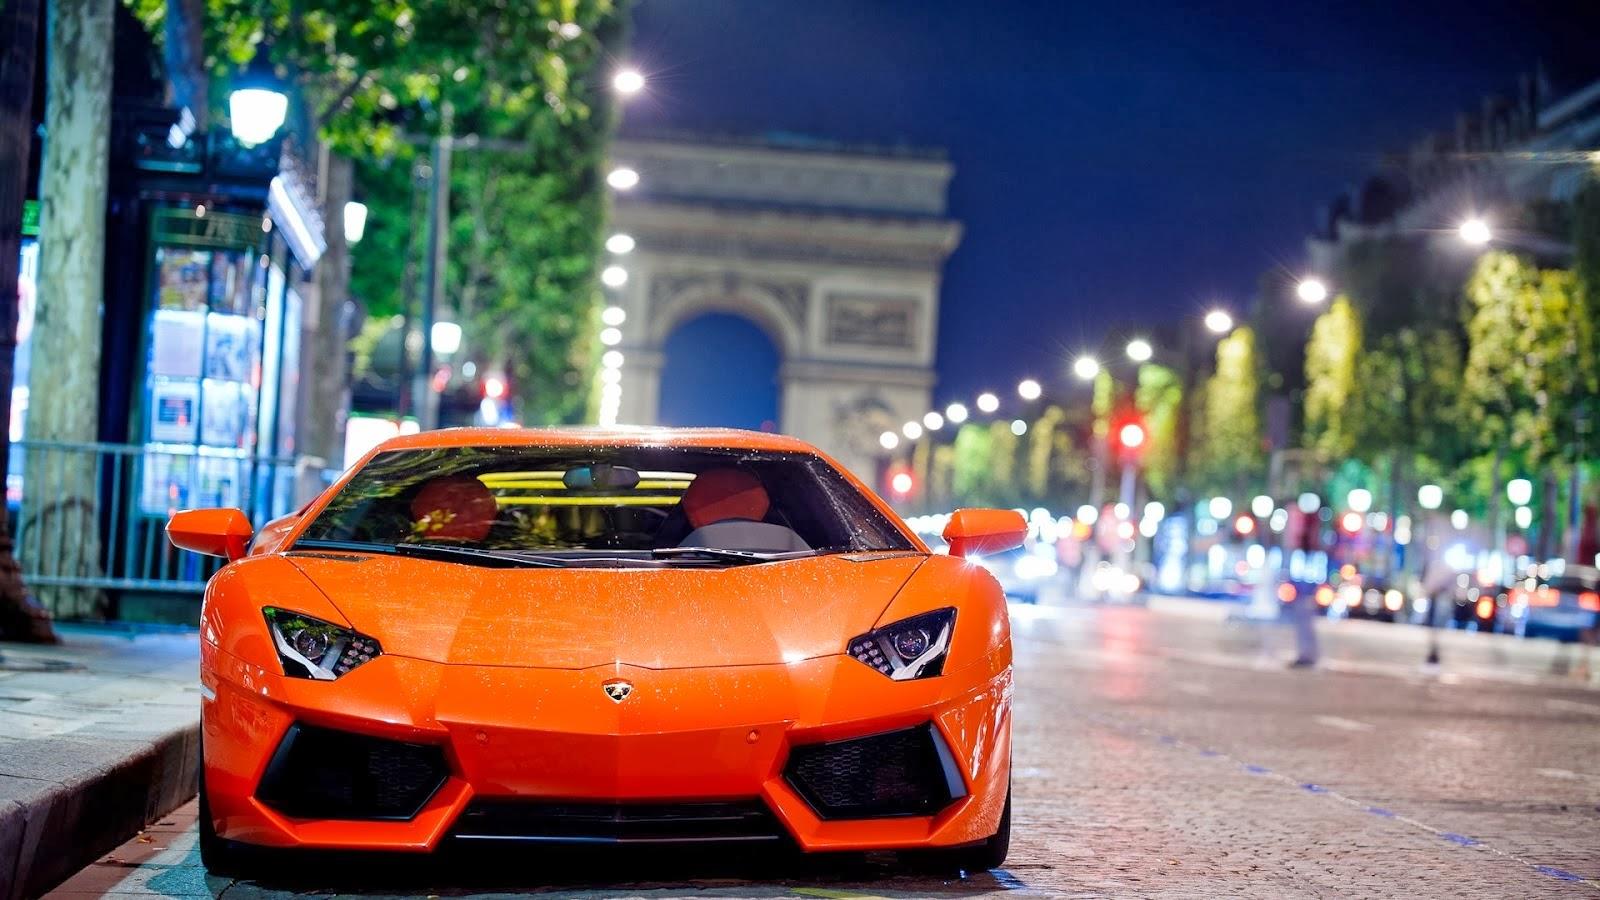 All Hot Informations Download Lamborghini Cars Hd Wallpapers 1080p